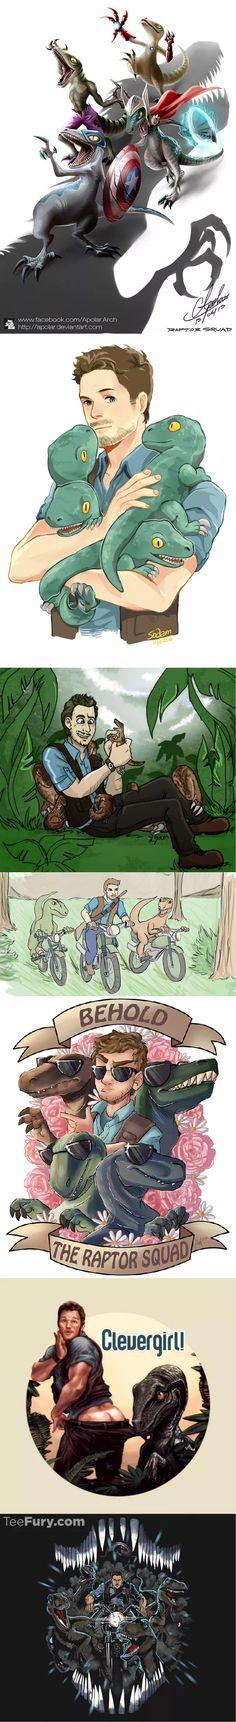 Owen Grady & the Raptors #JurassicWorld #ChrisPratt